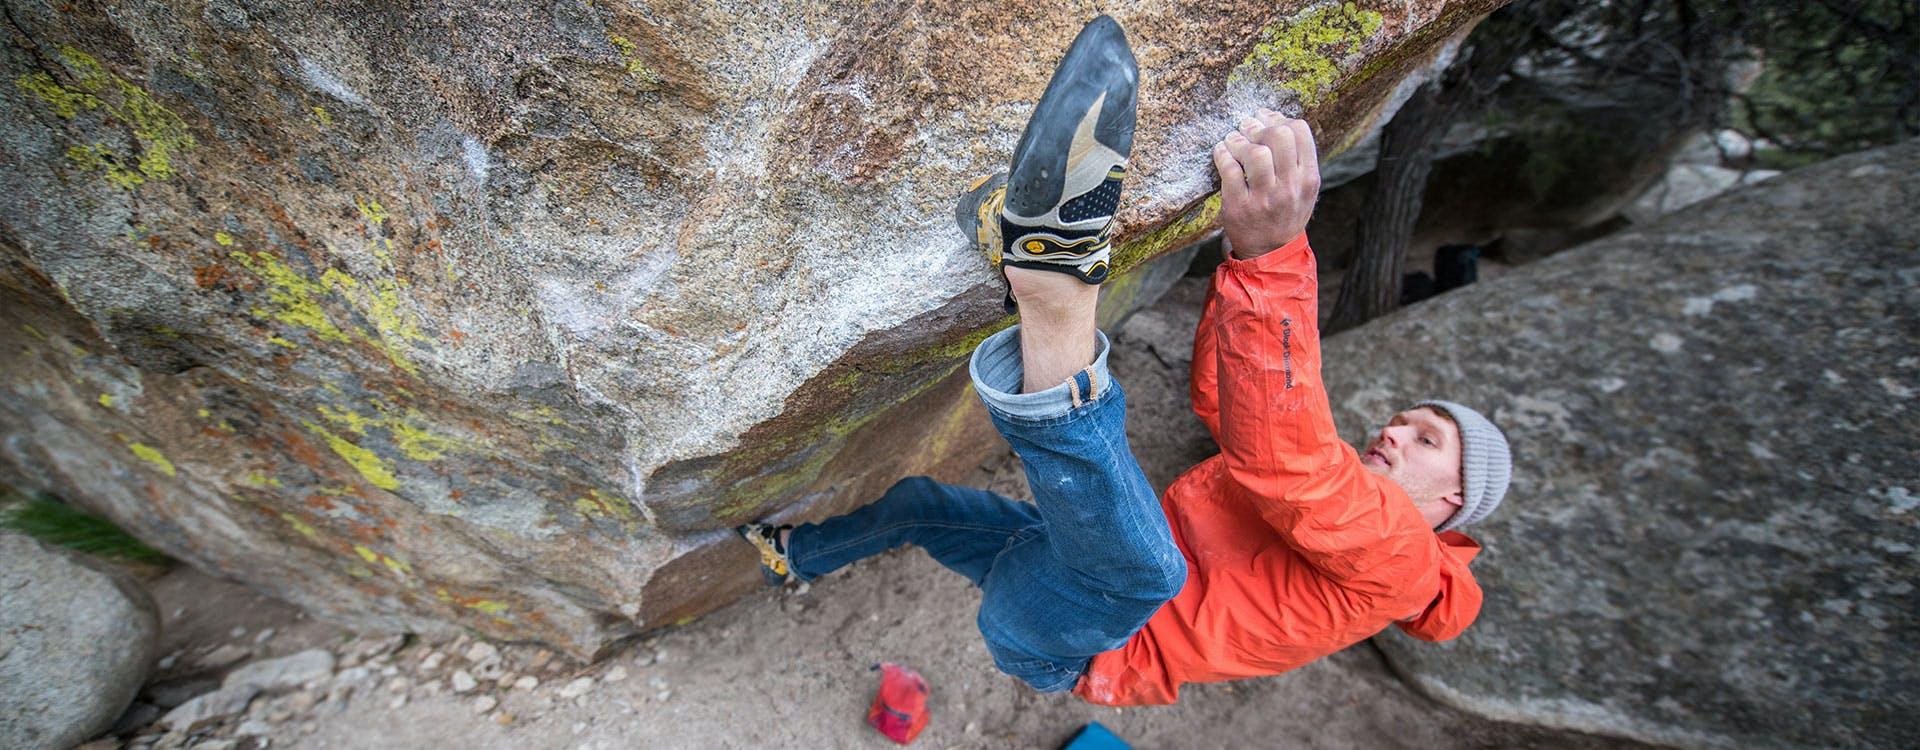 climber on a wall